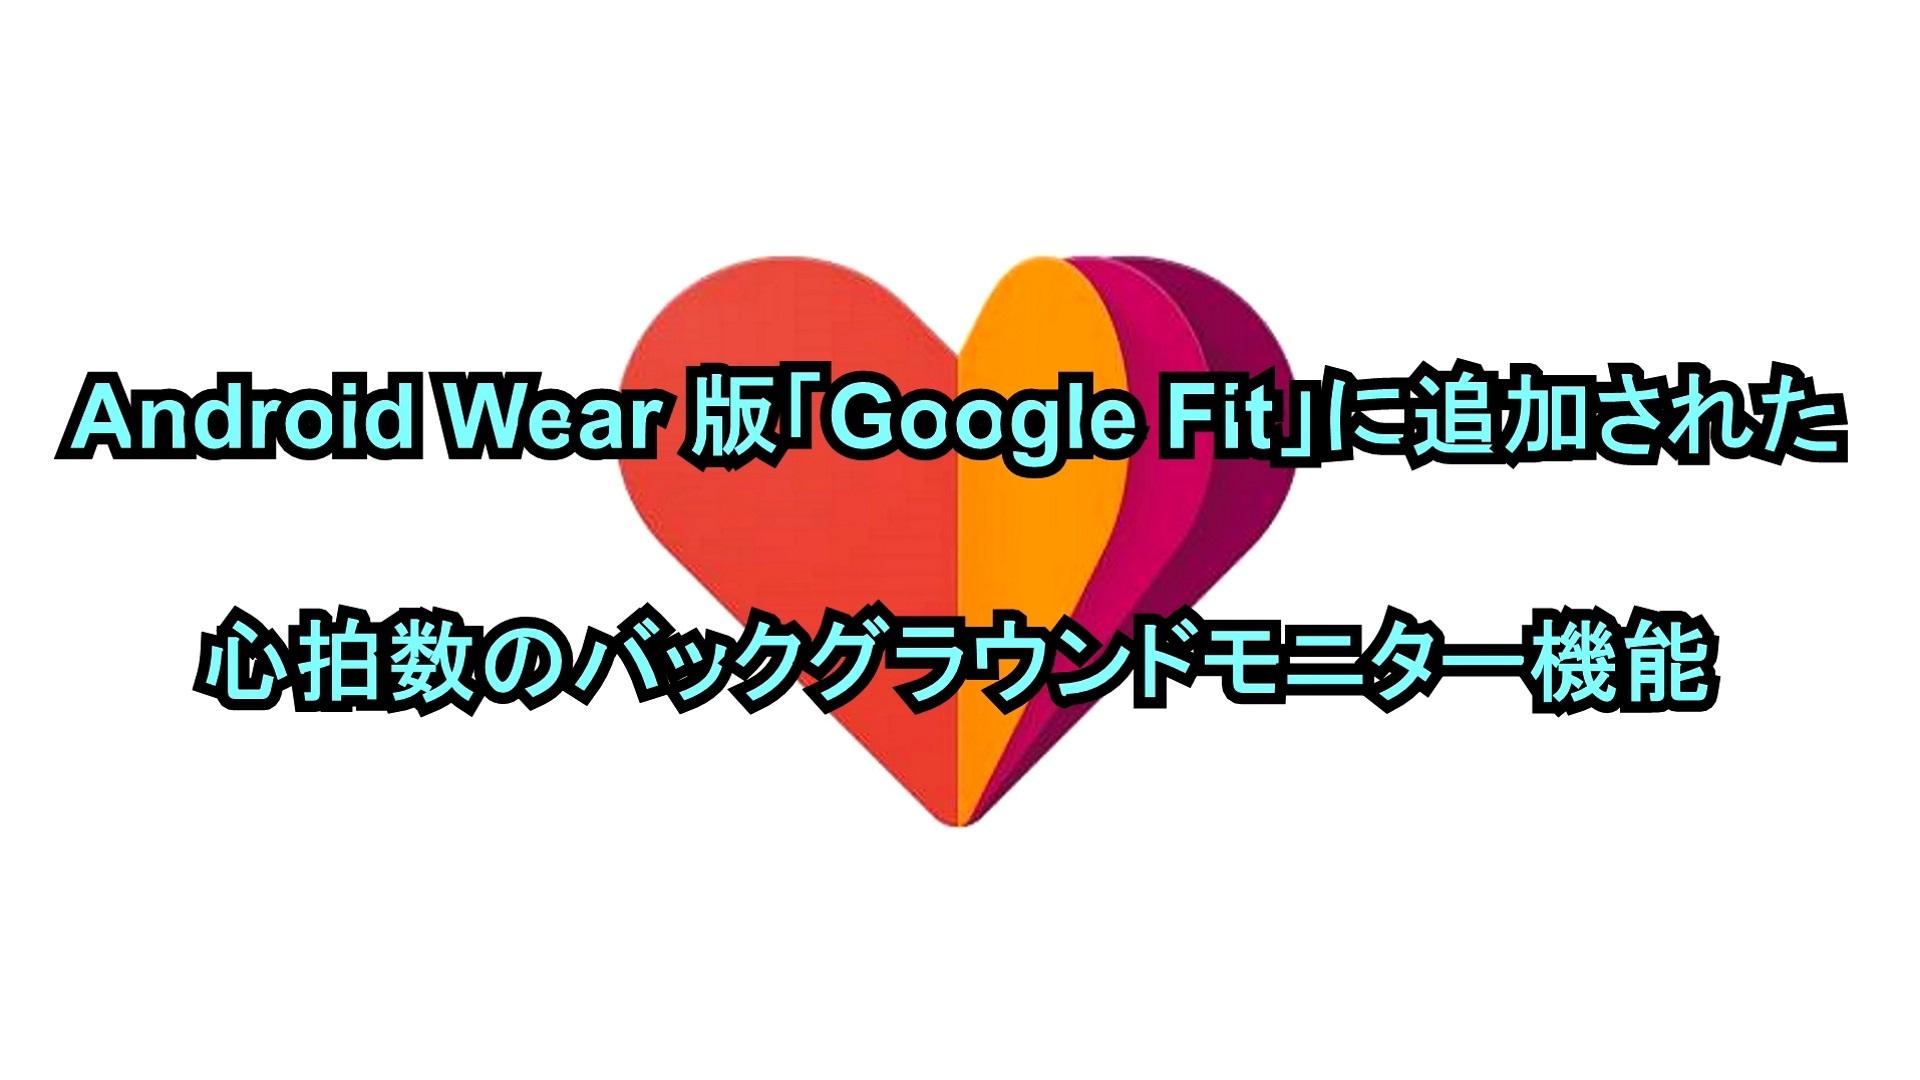 Android Wear版「Google Fit」に追加された心拍数のバックグラウンドモニター機能